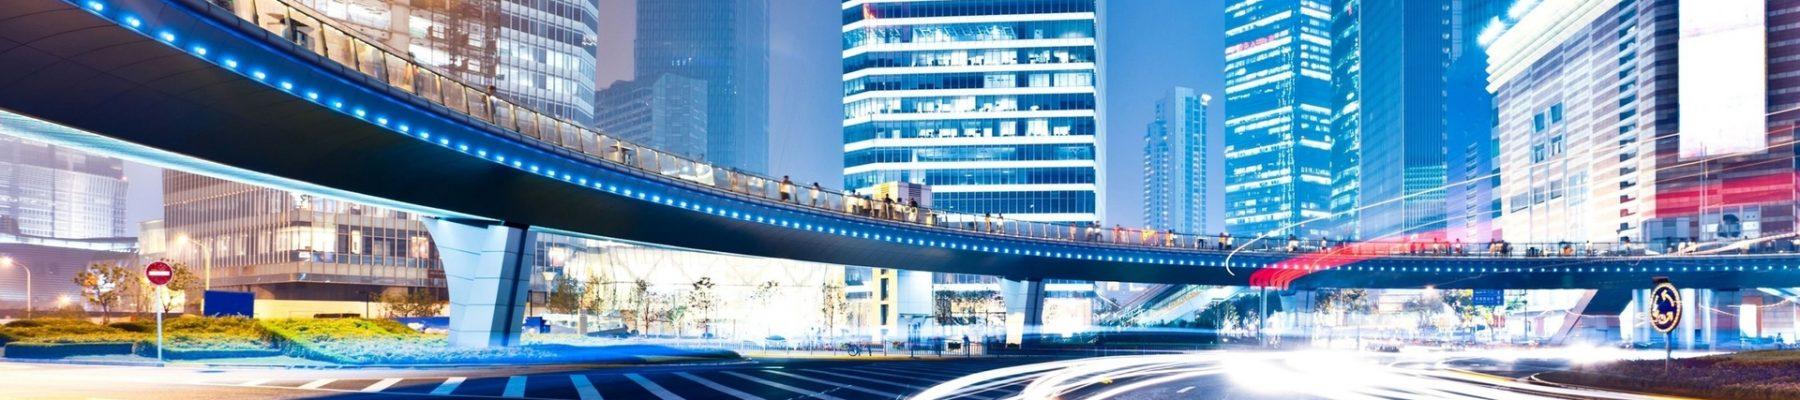 City Building Night Movement